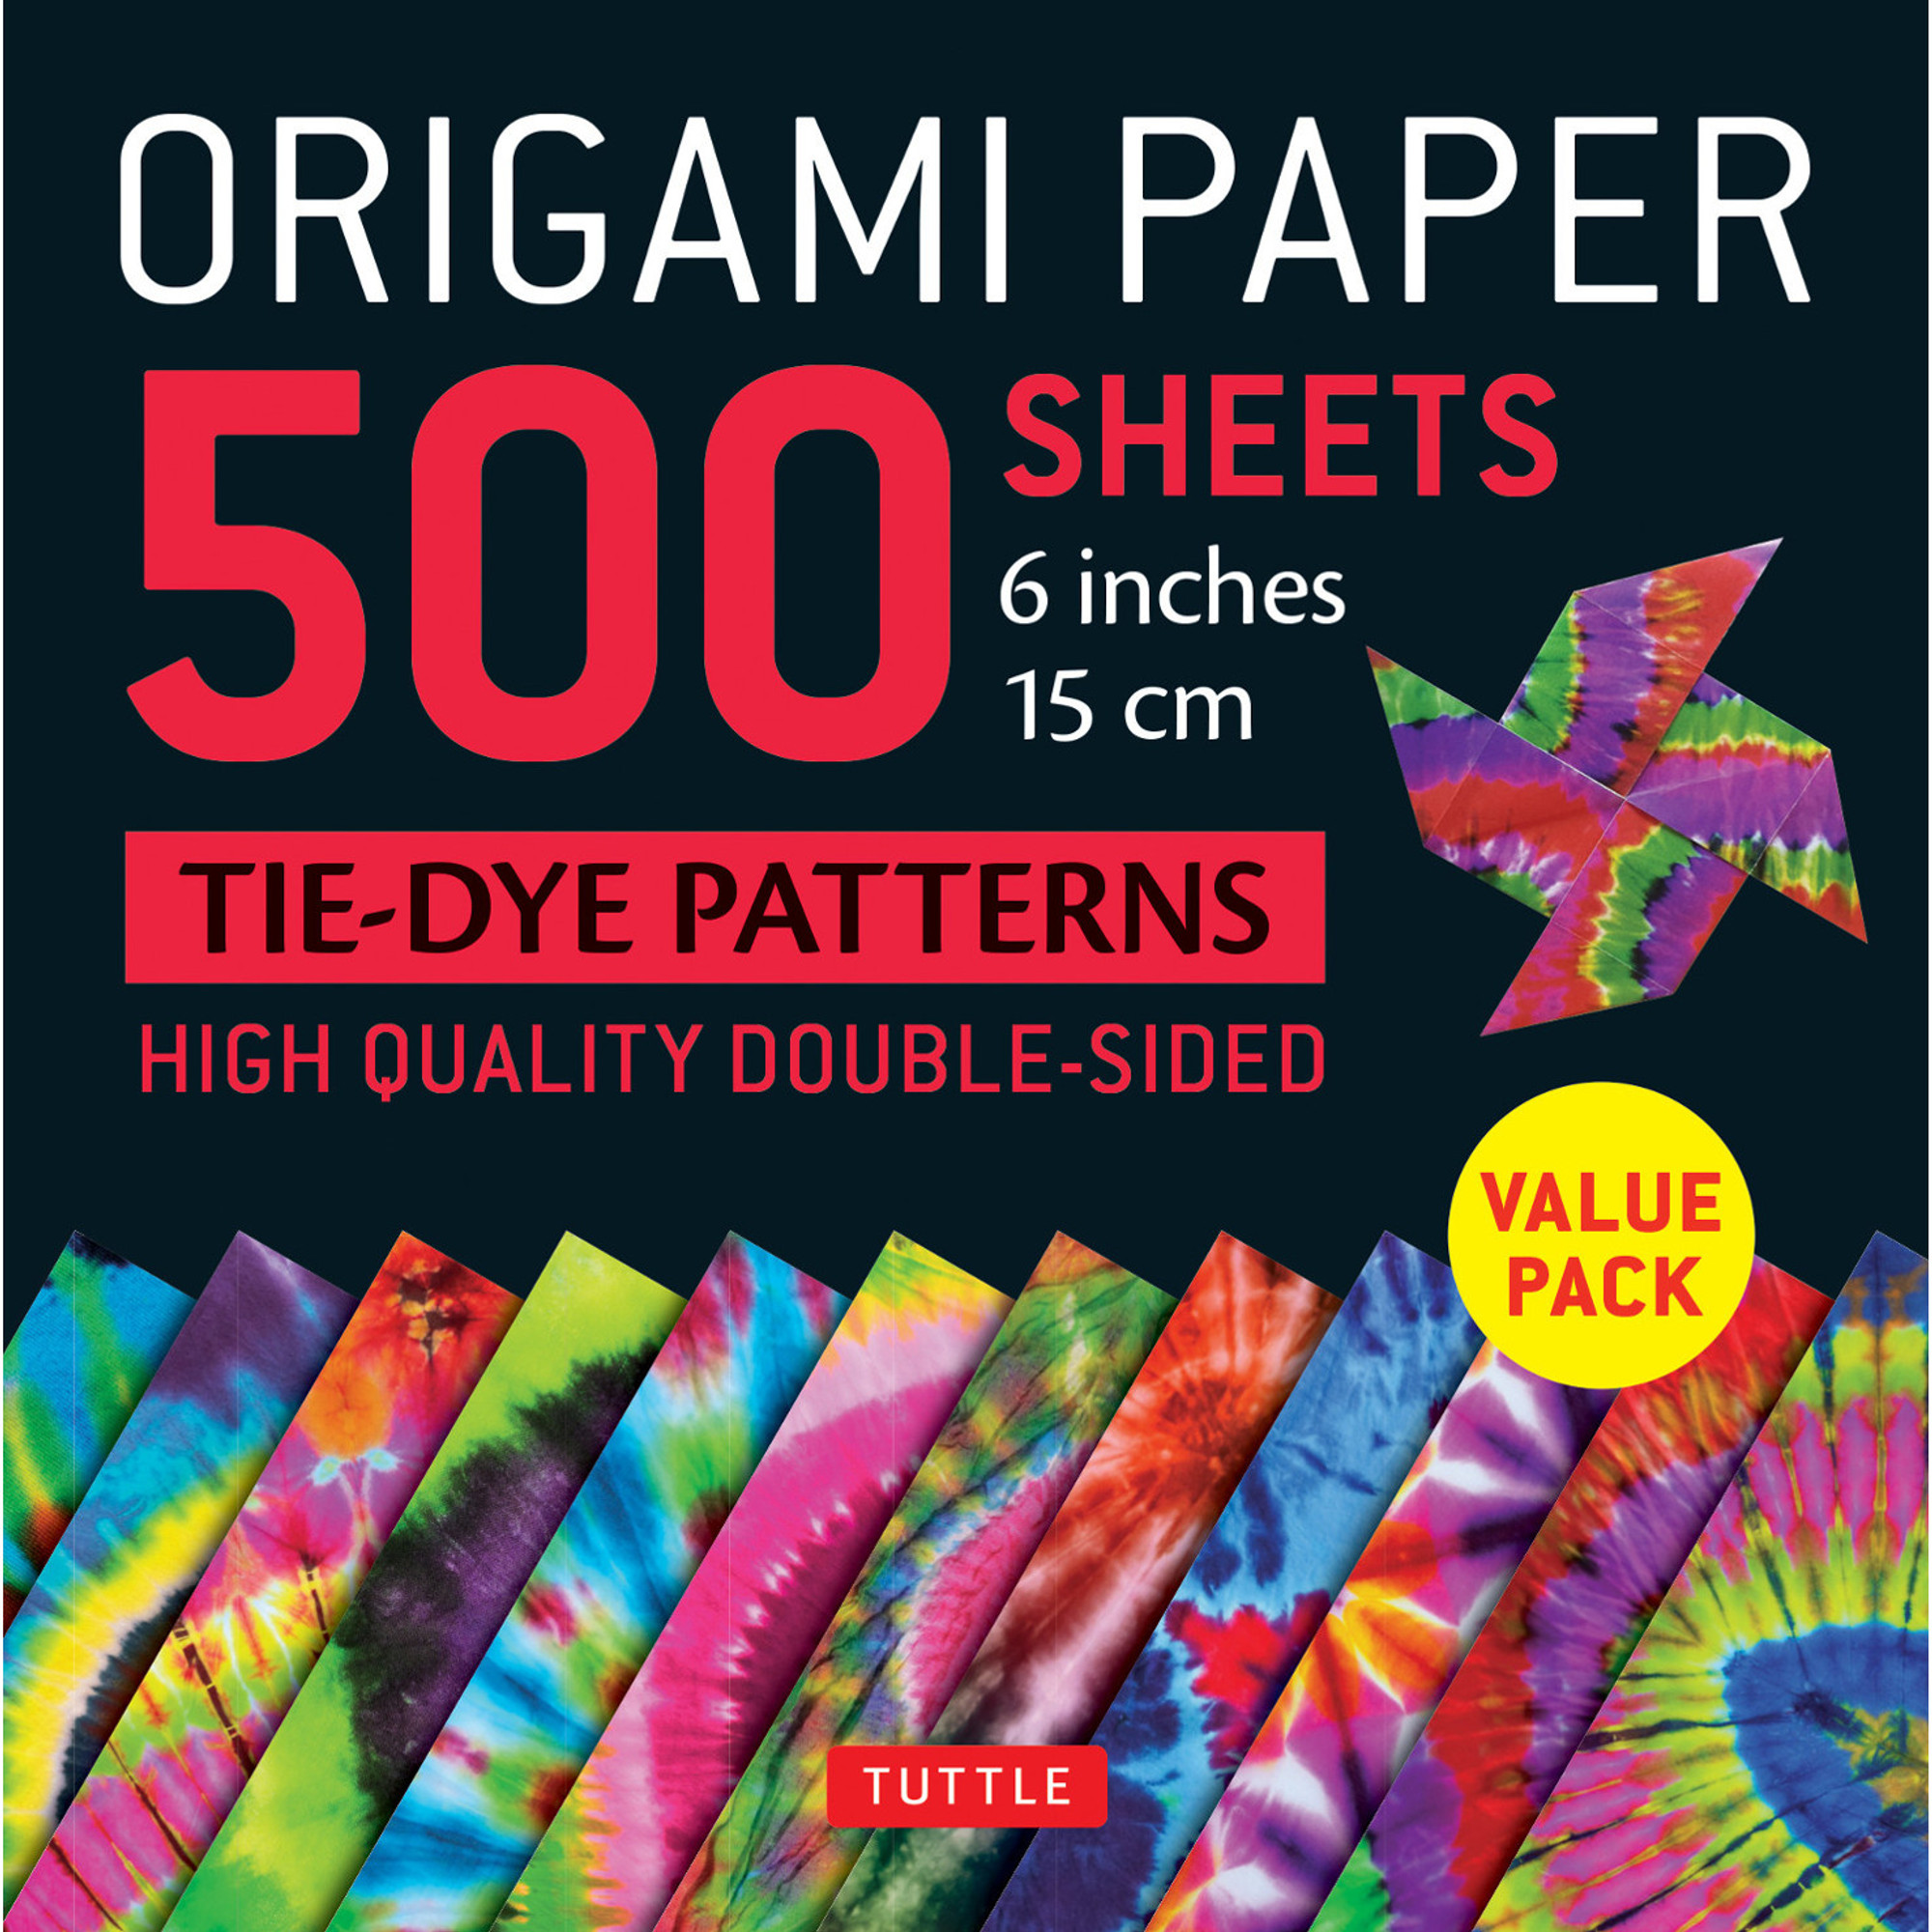 Origami Paper 500 Sheets Tie Dye Patterns 6 15 Cm Tuttle Publishing